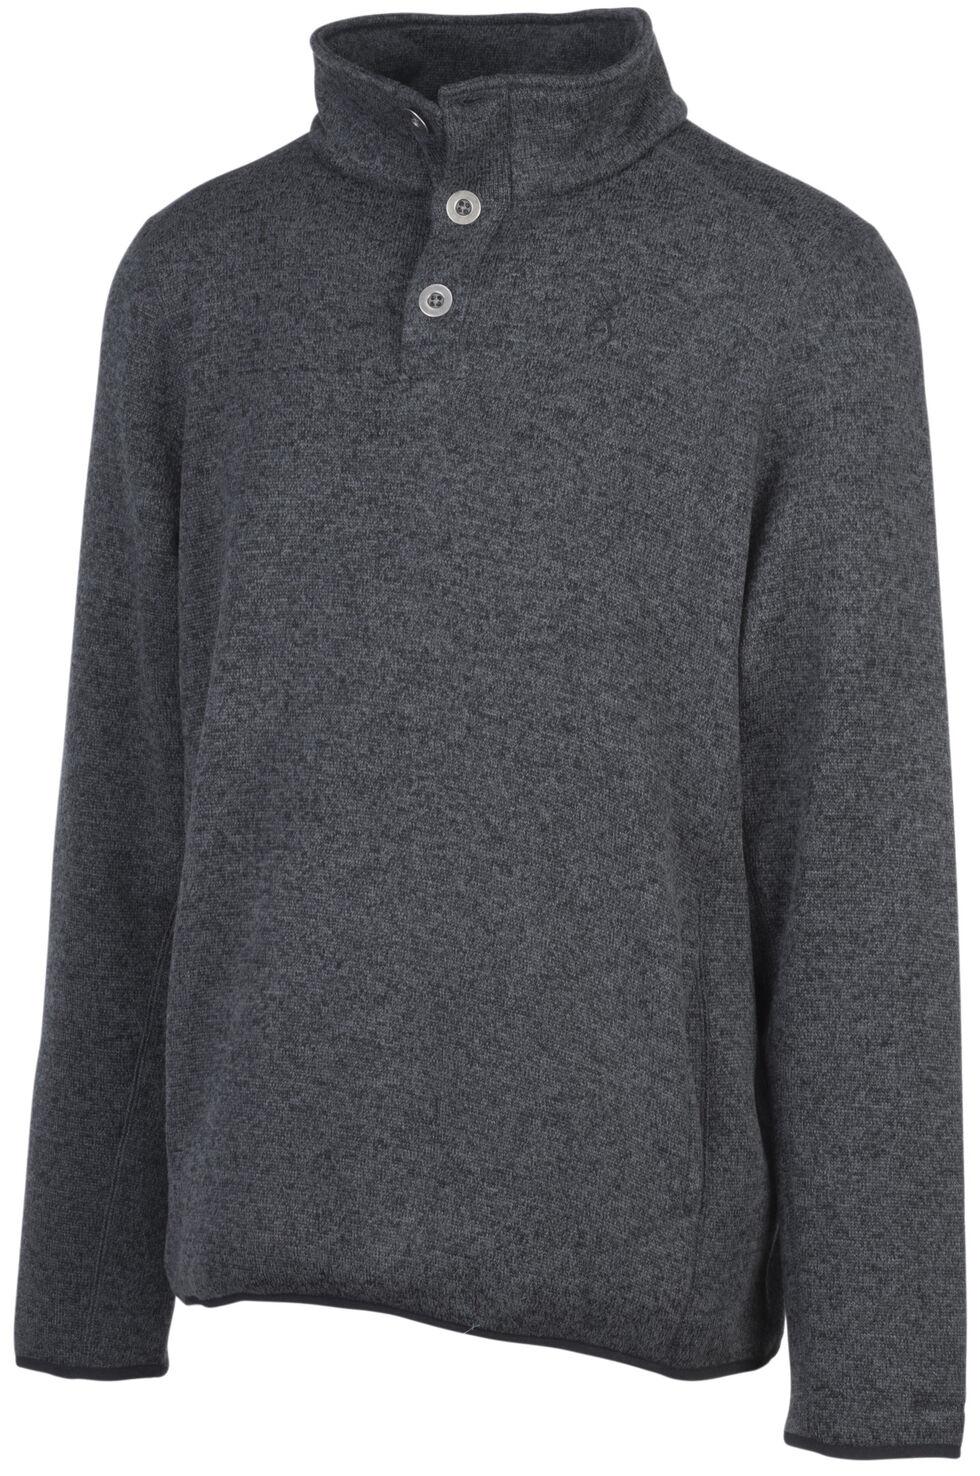 Browning Men's Black Gilson Sweater, Black, hi-res